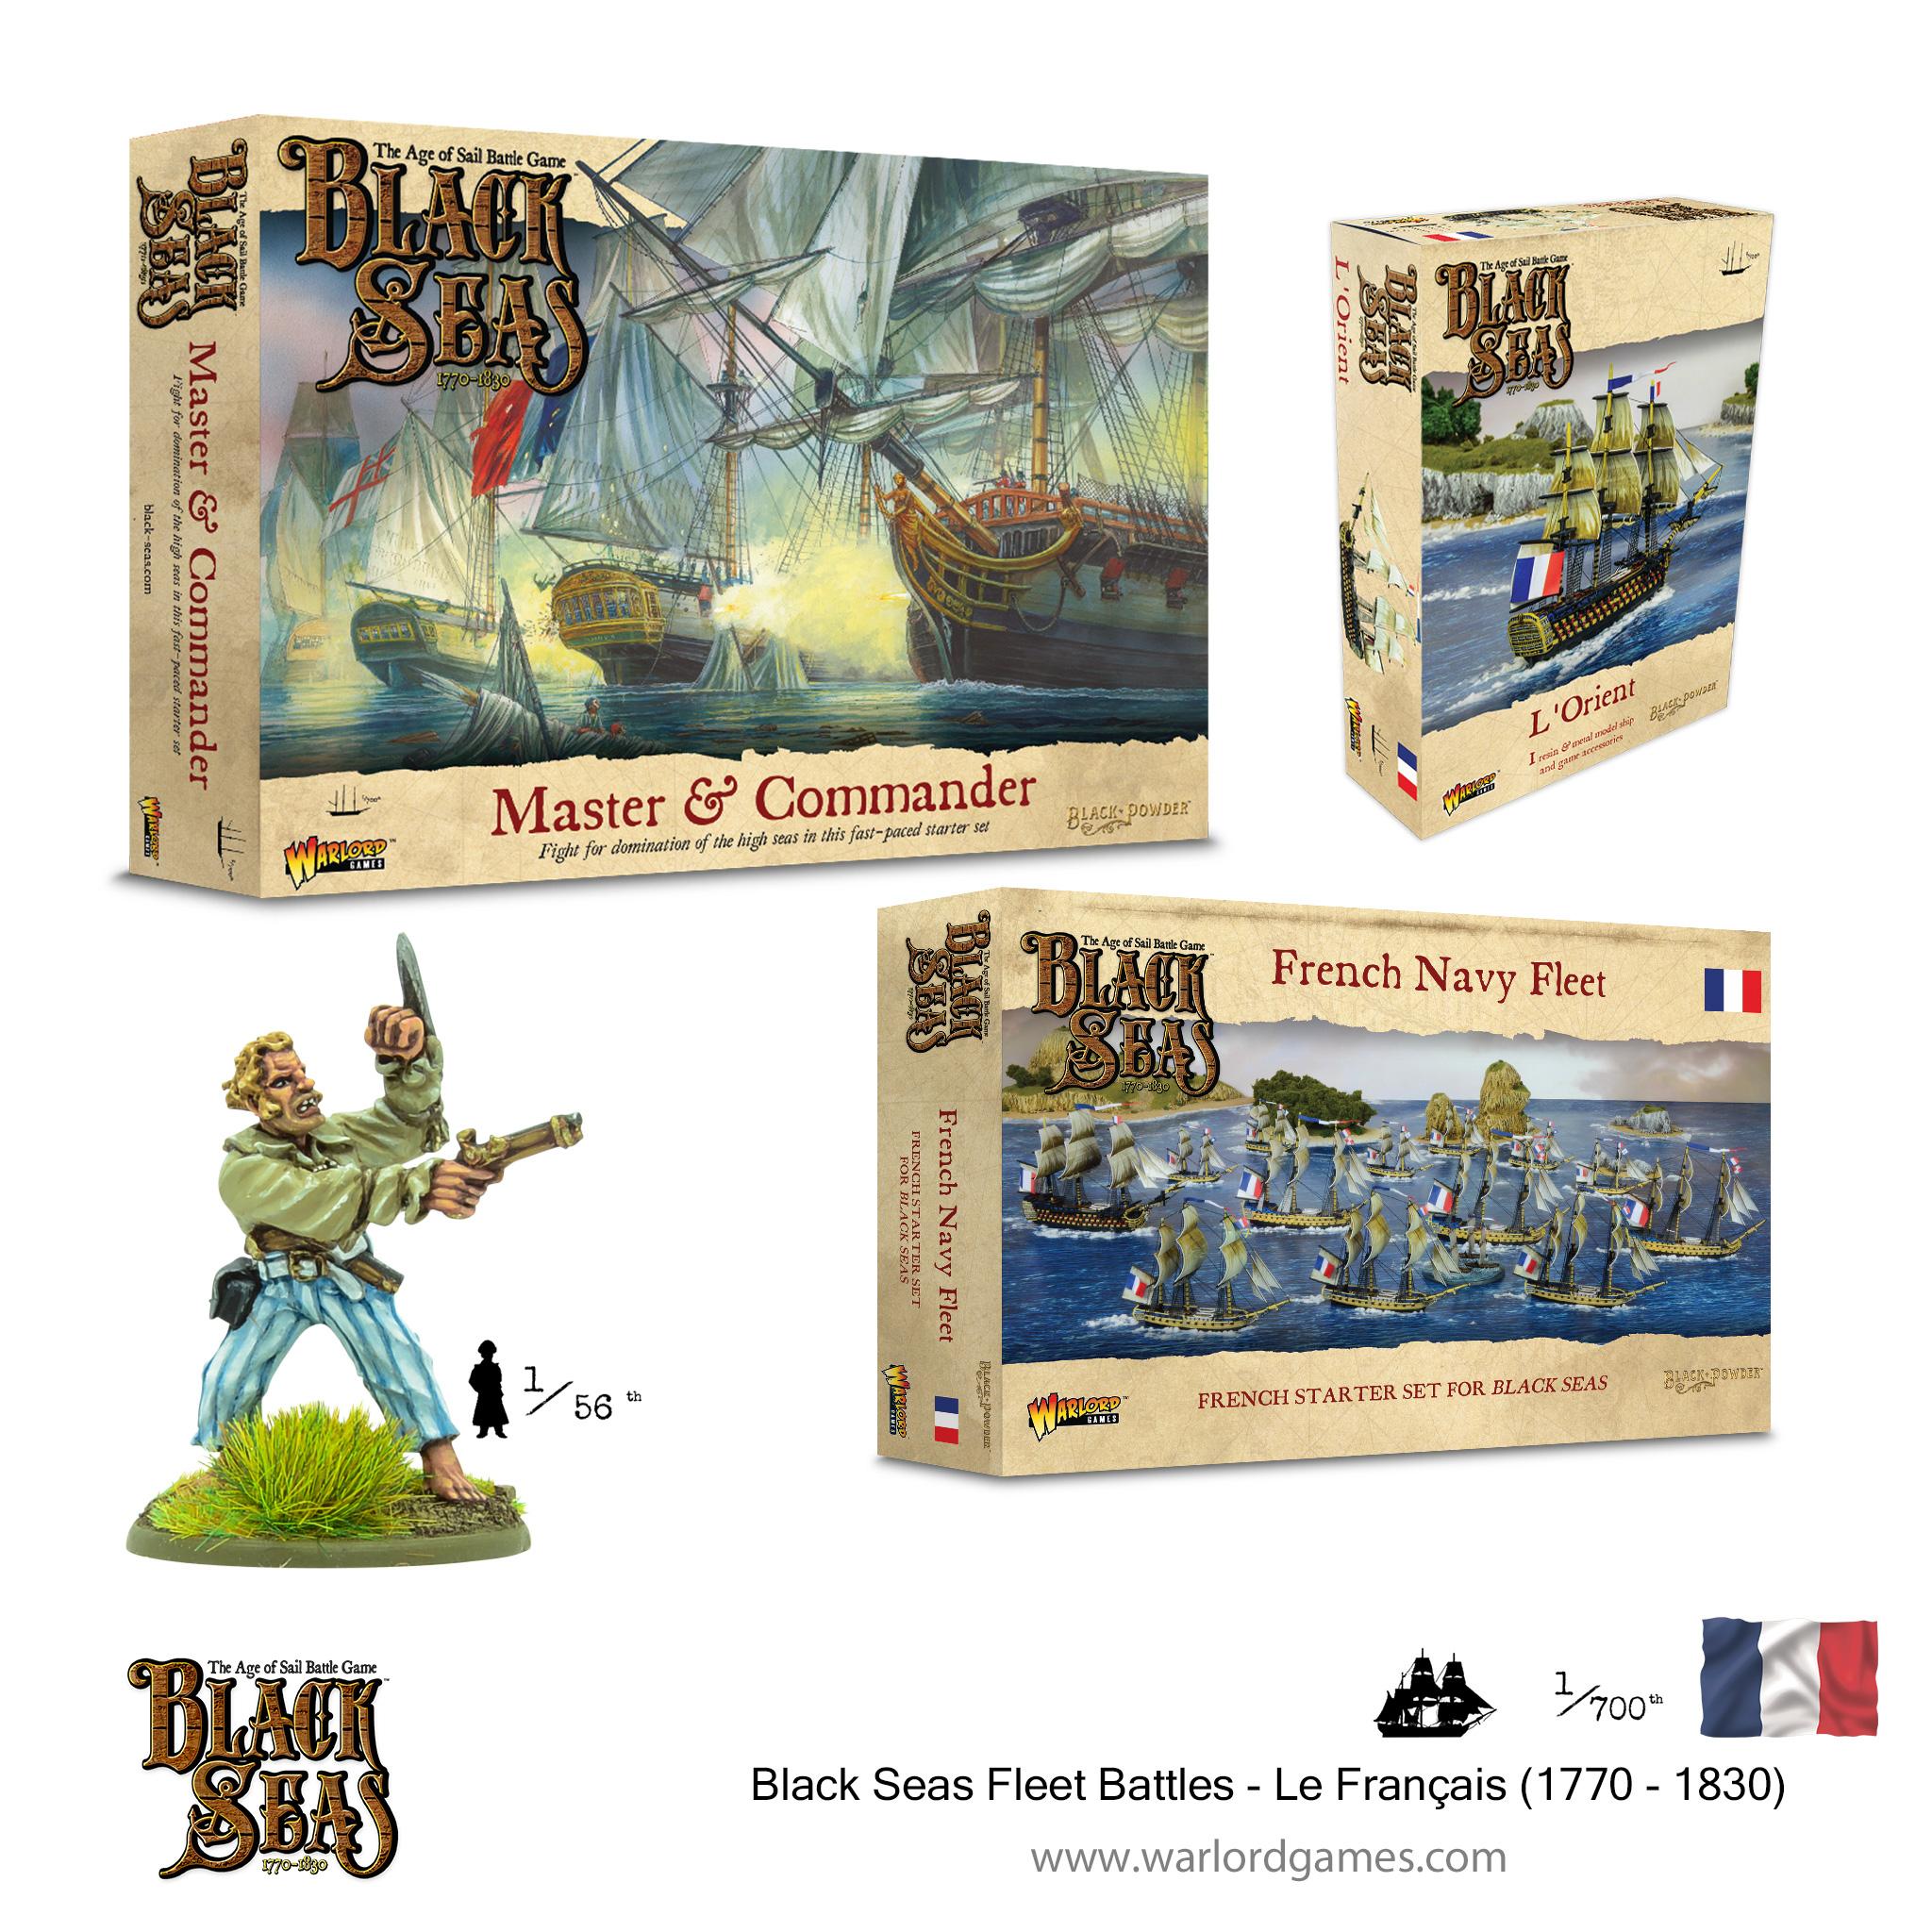 Black Seas Fleet Battles - Le Français (1770 - 1830)